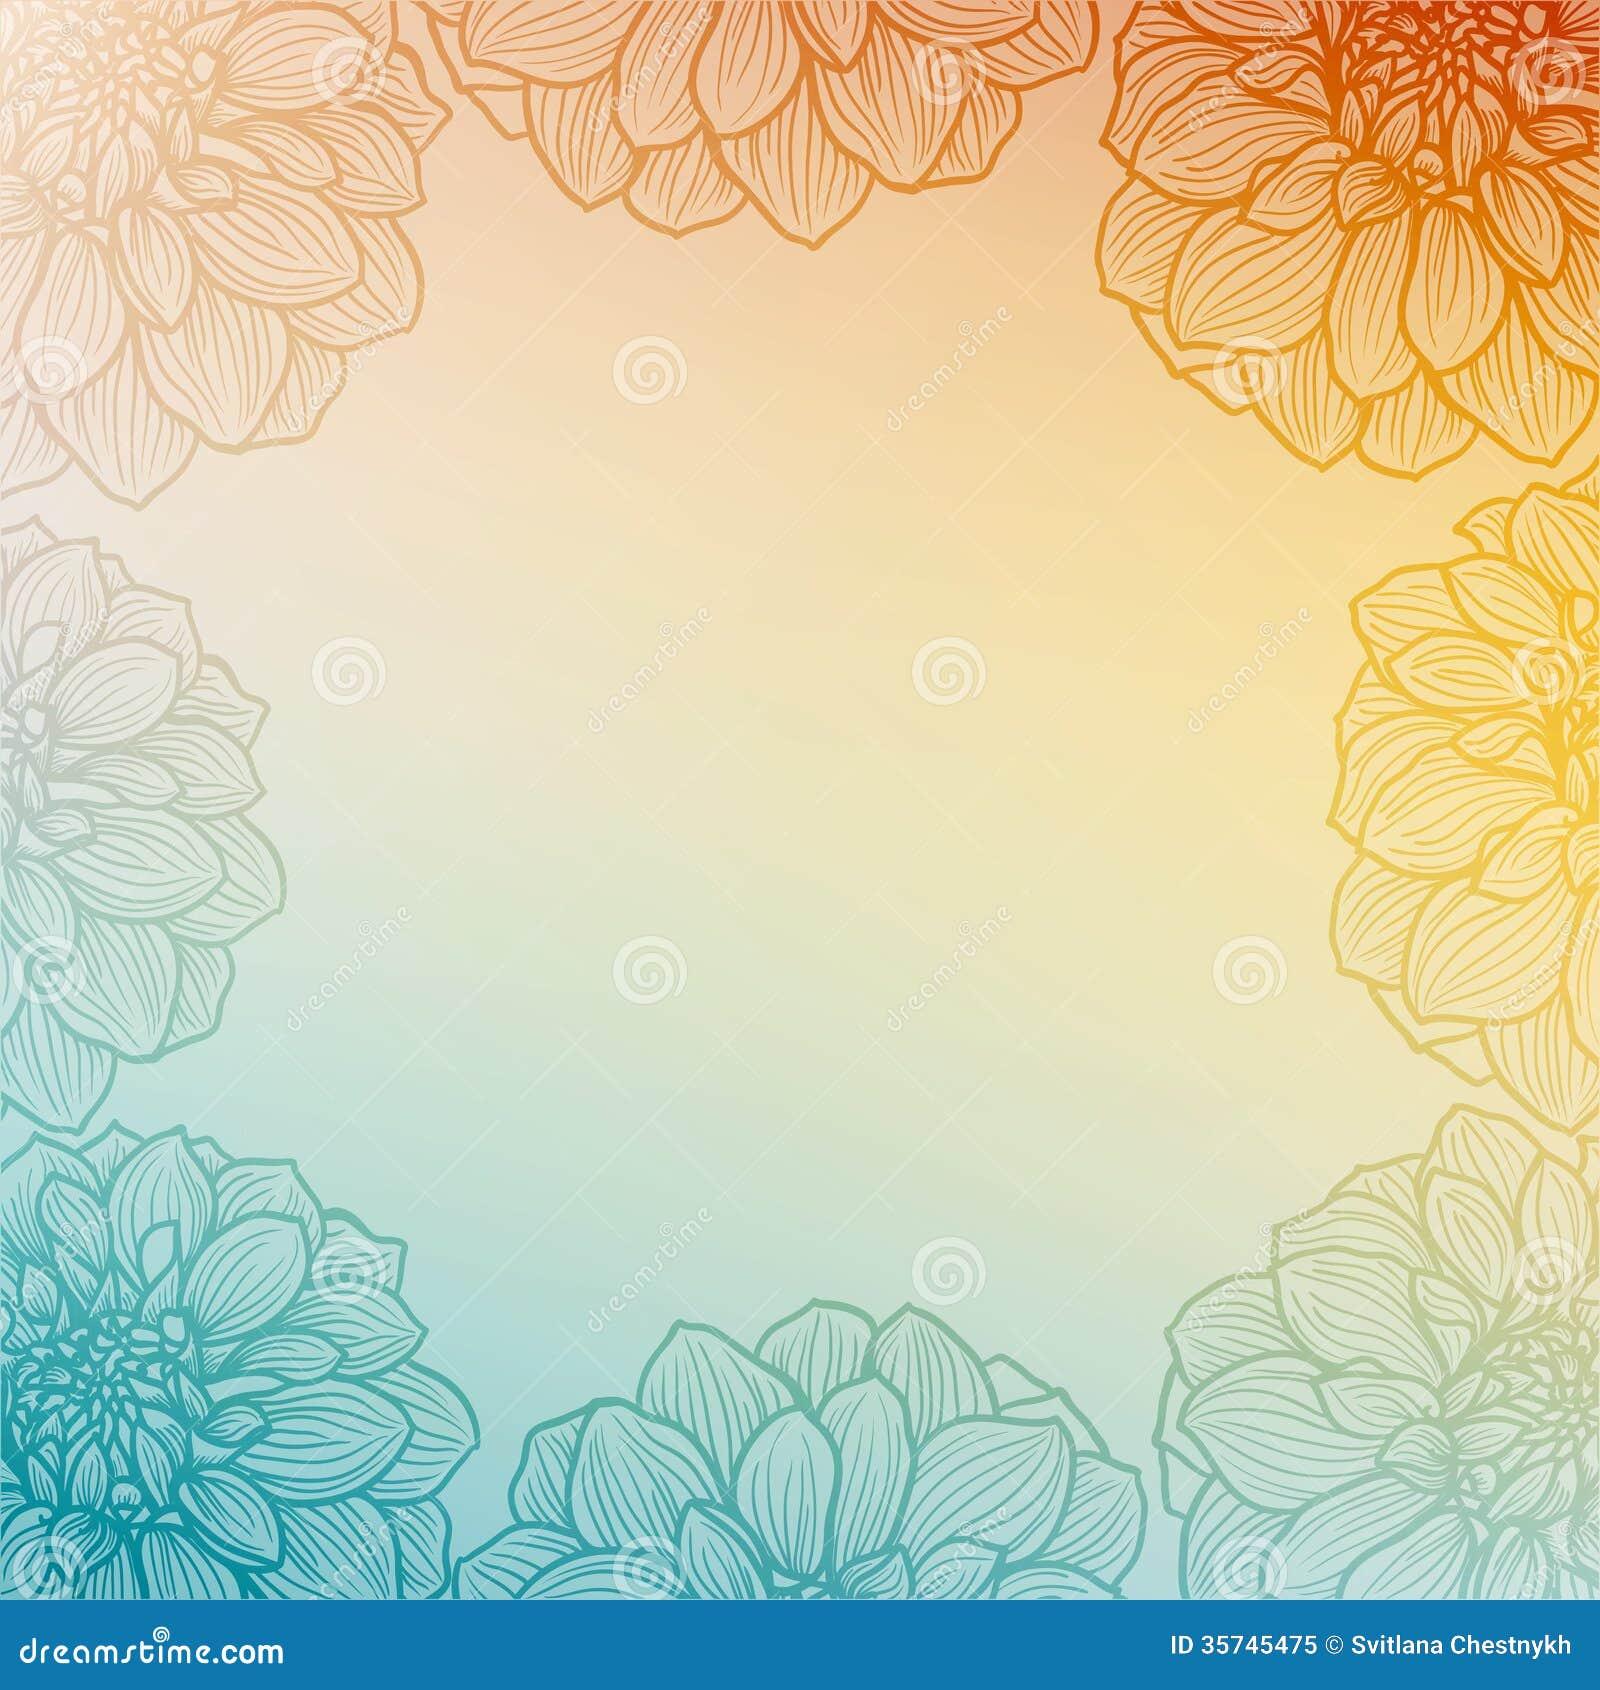 Hand Drawn Dahlia Flower Royalty Free Stock Photo Image 35745475